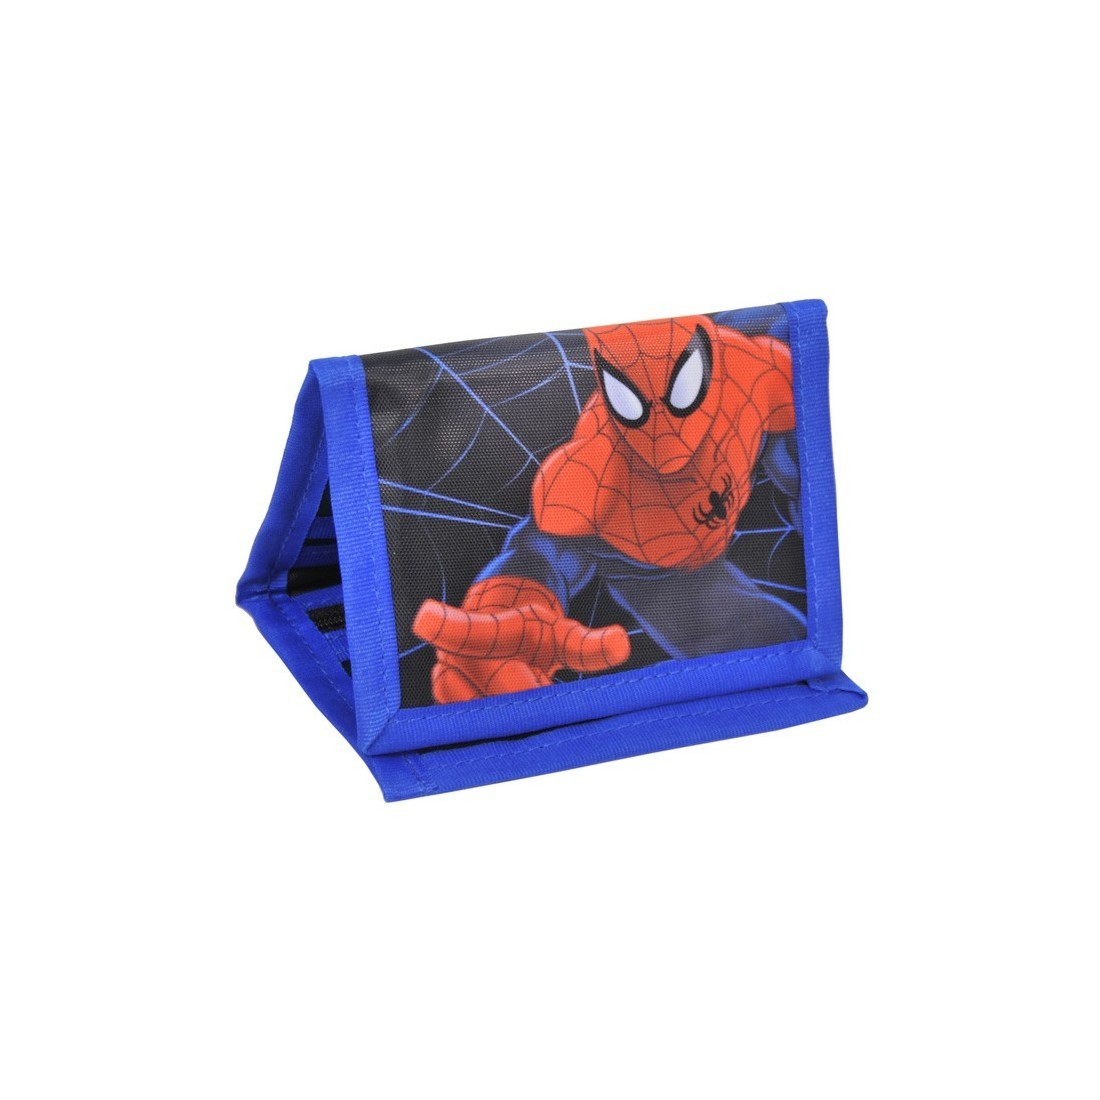 Portfel dziecięcy Spider-Man - plecak-tornister.pl